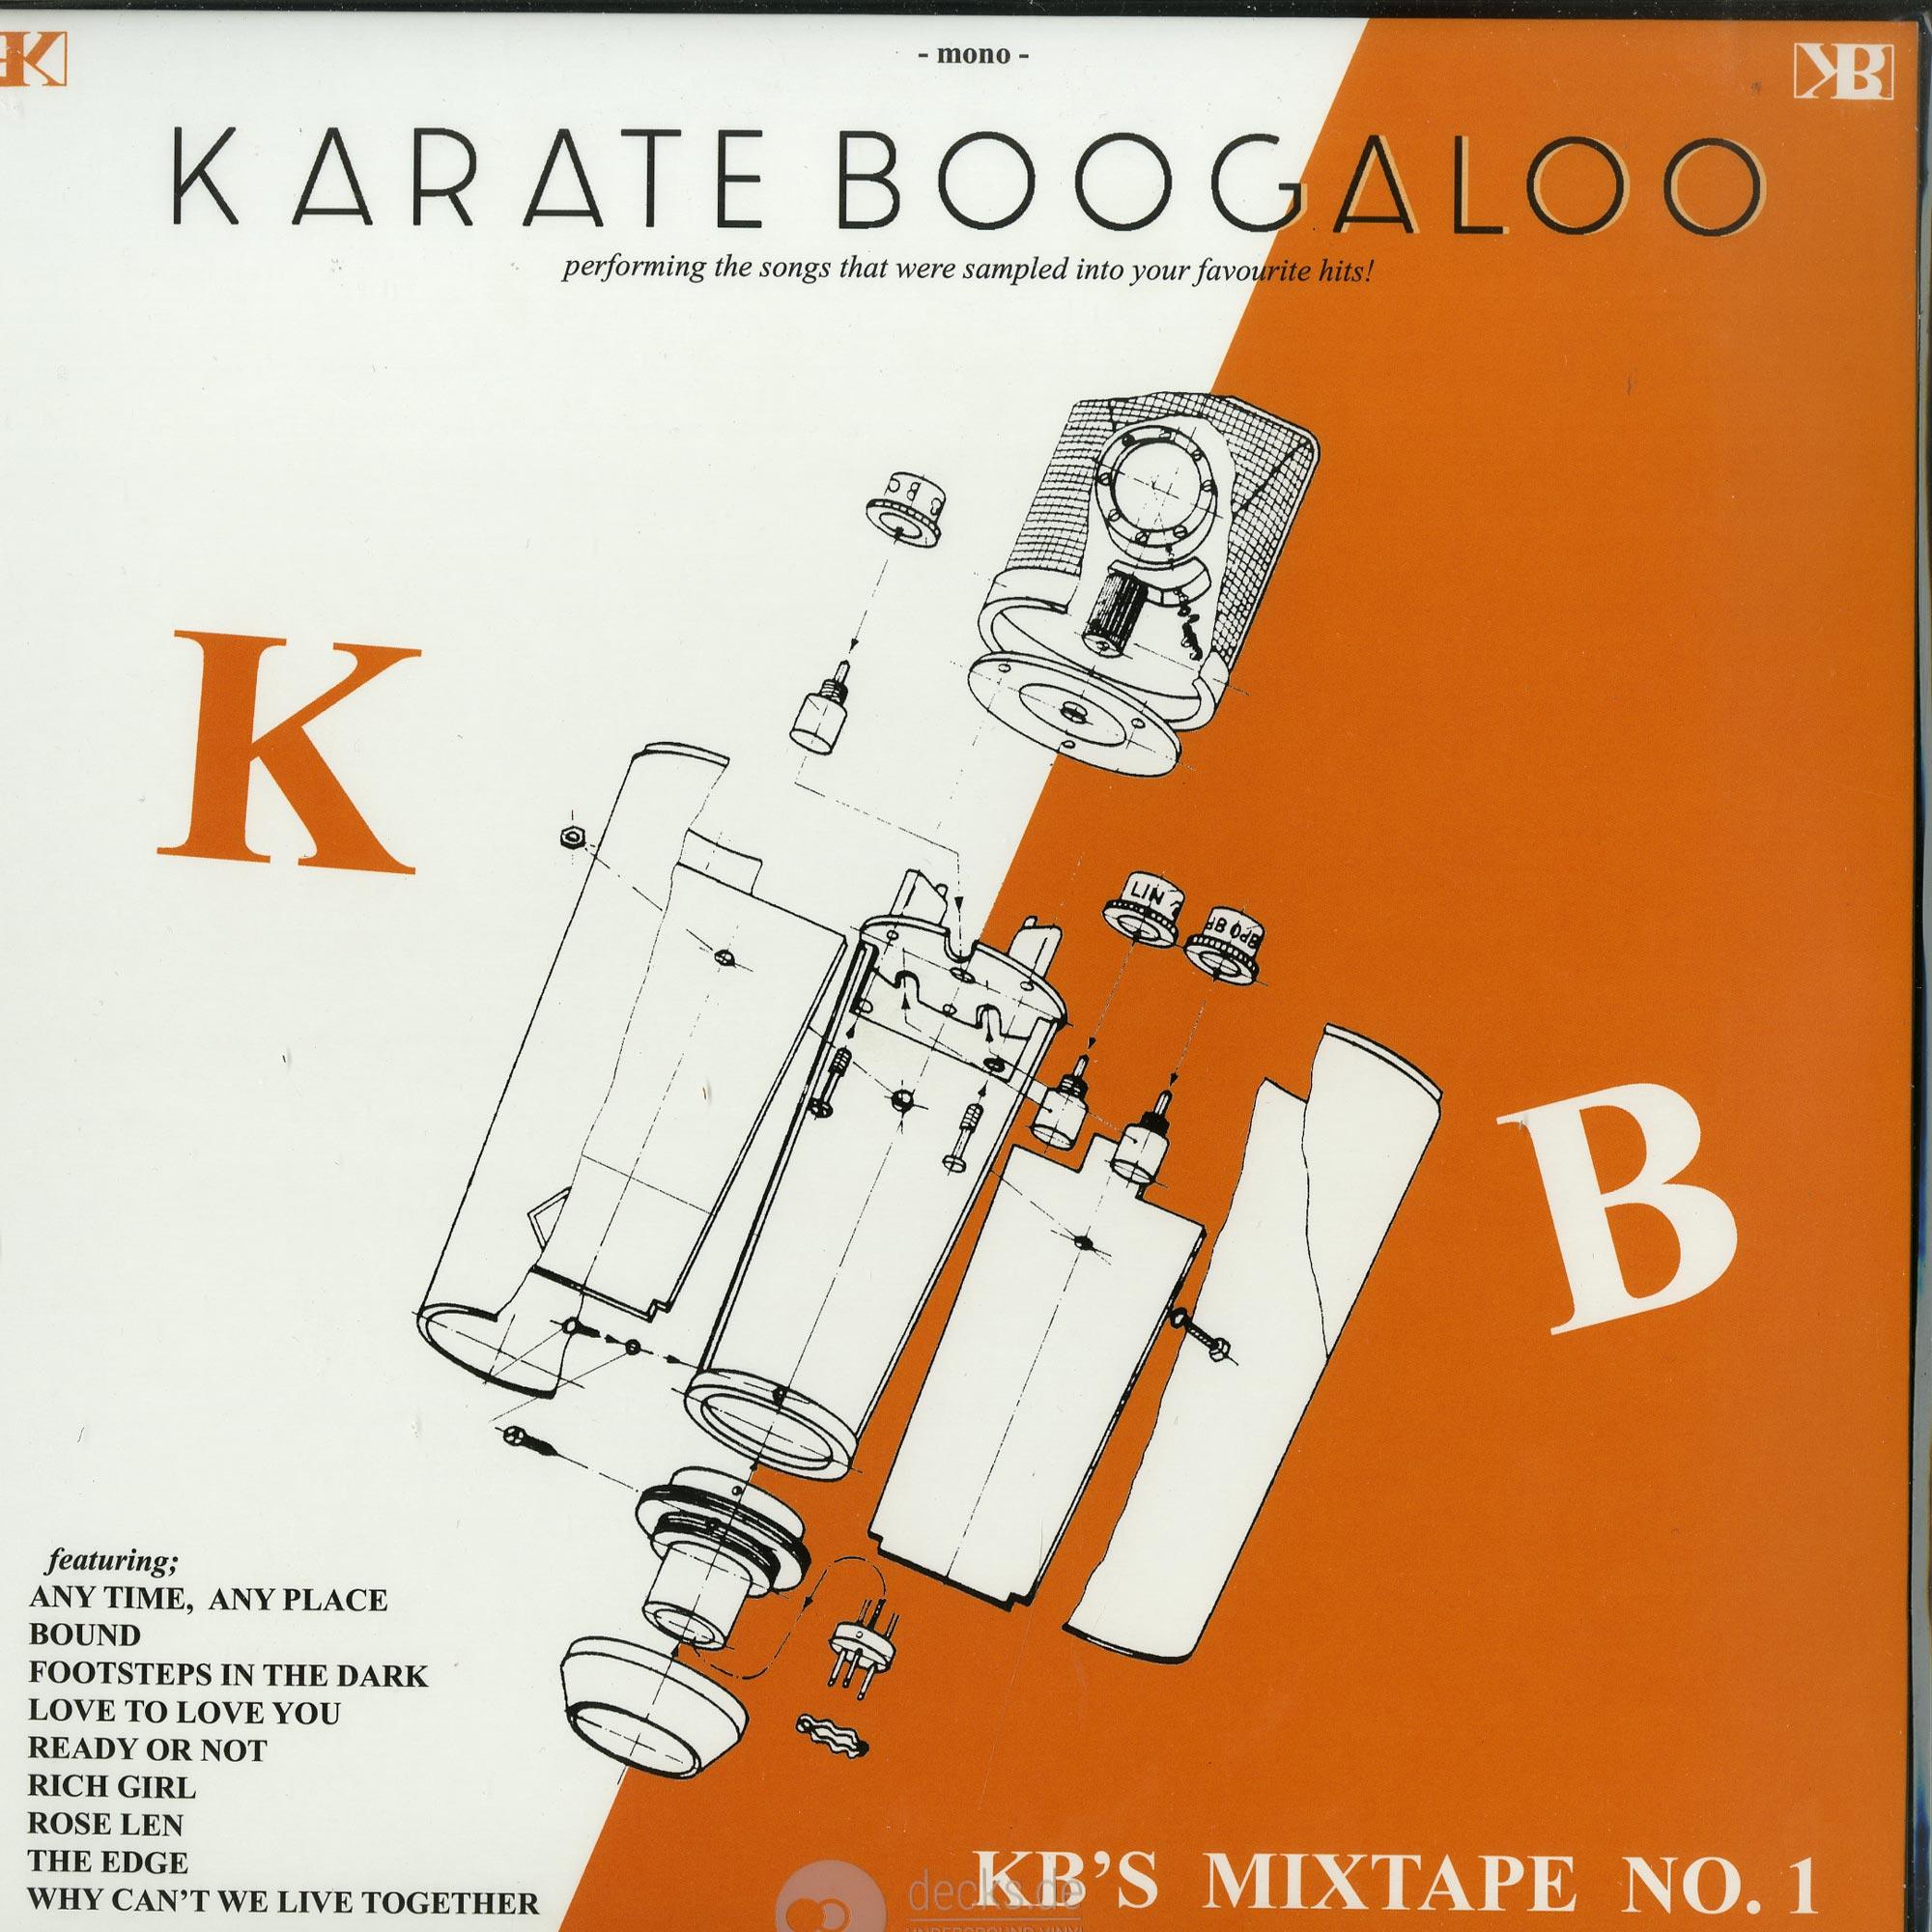 Karate Boogaloo - KBS MIXTAPE NO. 1